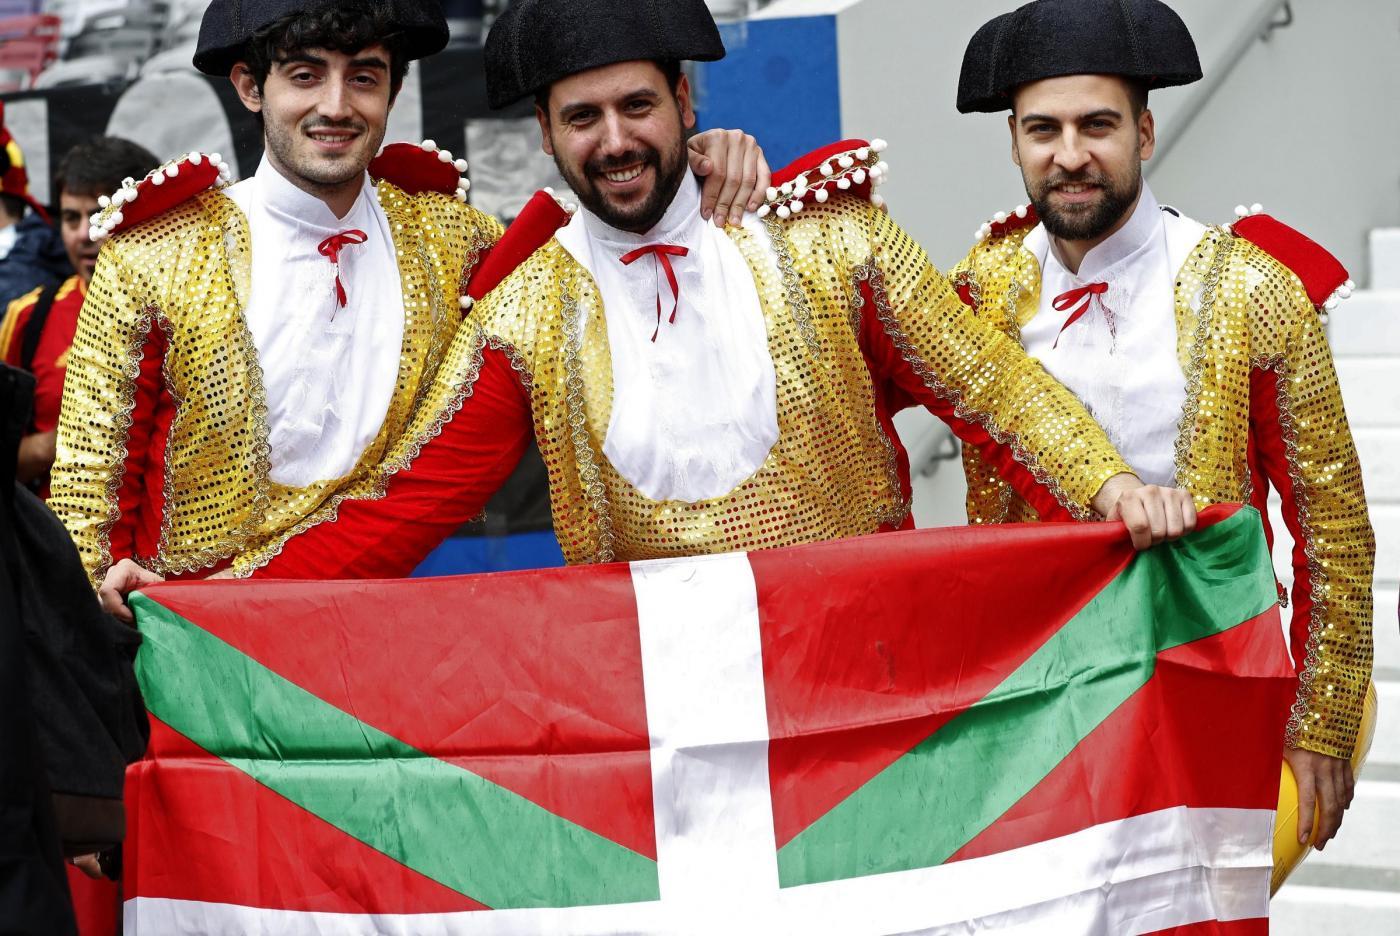 Spagna U21-Islanda U21 giovedì 9 novembre, analisi e pronostico qualificazioni Europei Under 21